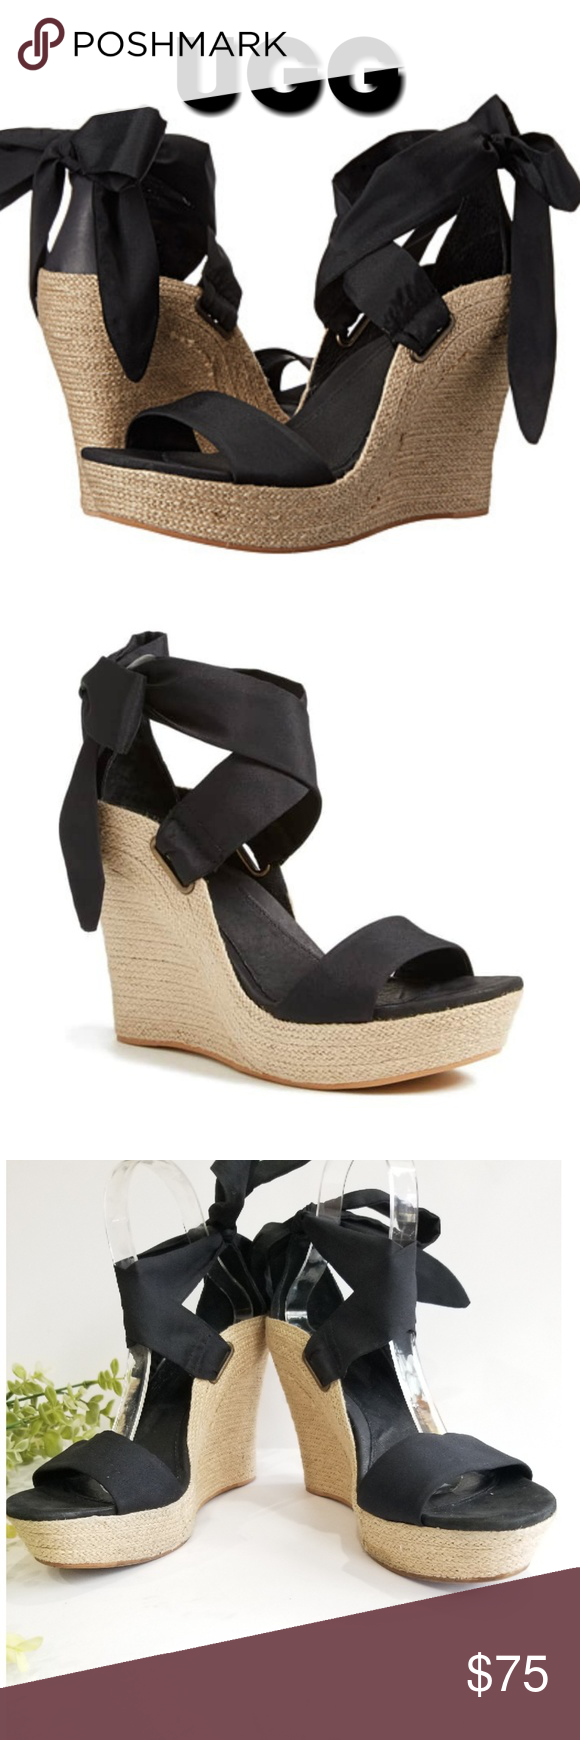 680e760e41ad UGG Jules espadrille wedge black tie Heel sandal 8 UGG 🖤 great condition